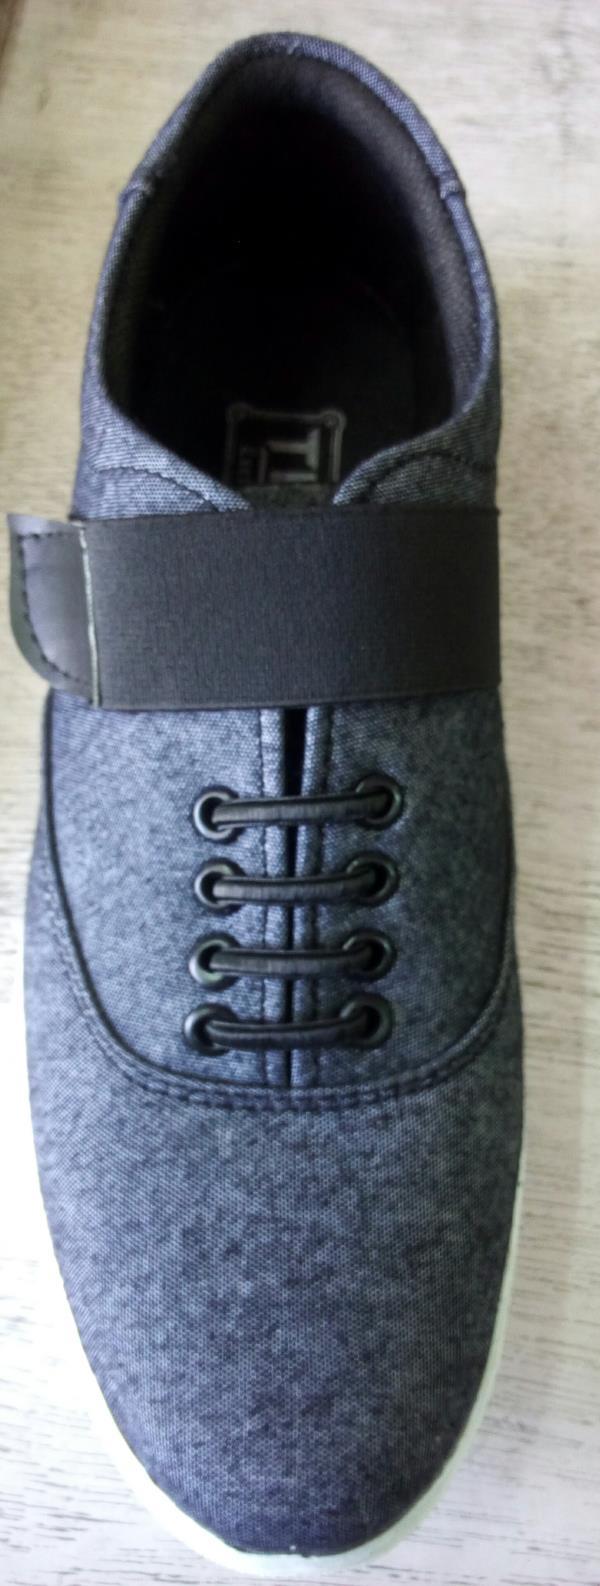 kelvin shoes